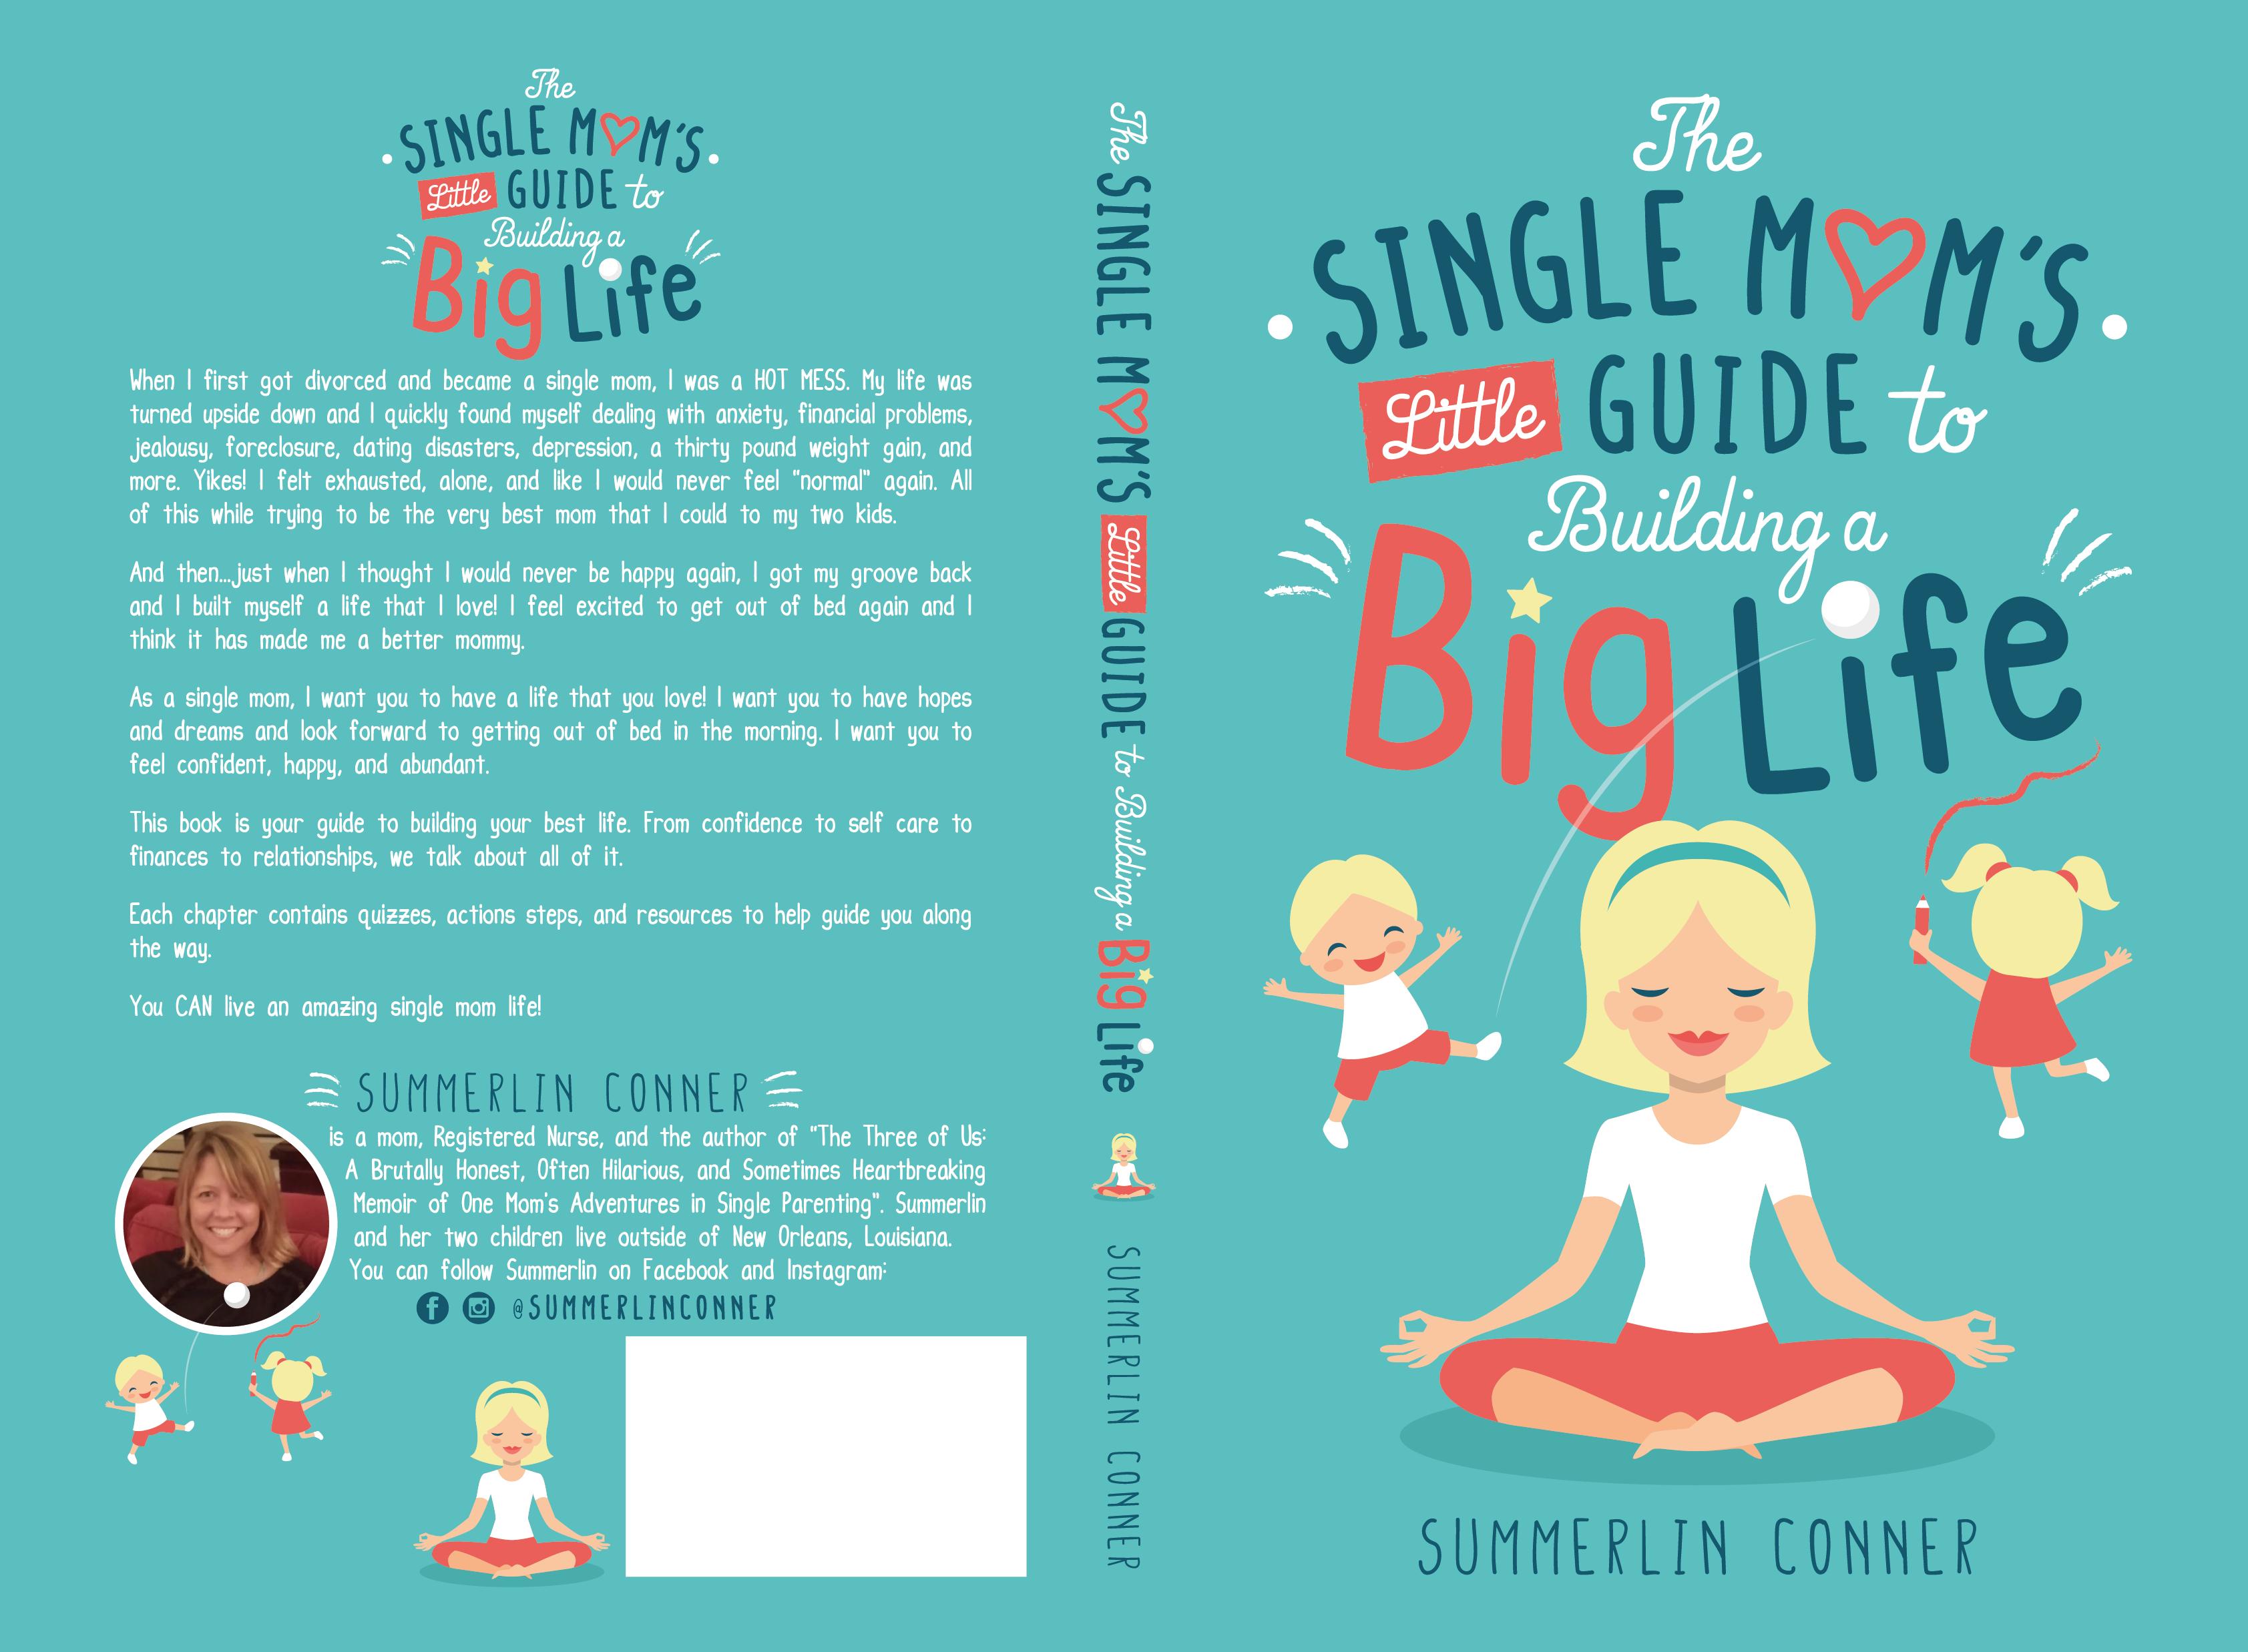 Fun, whimsical, colorful self-help book cover